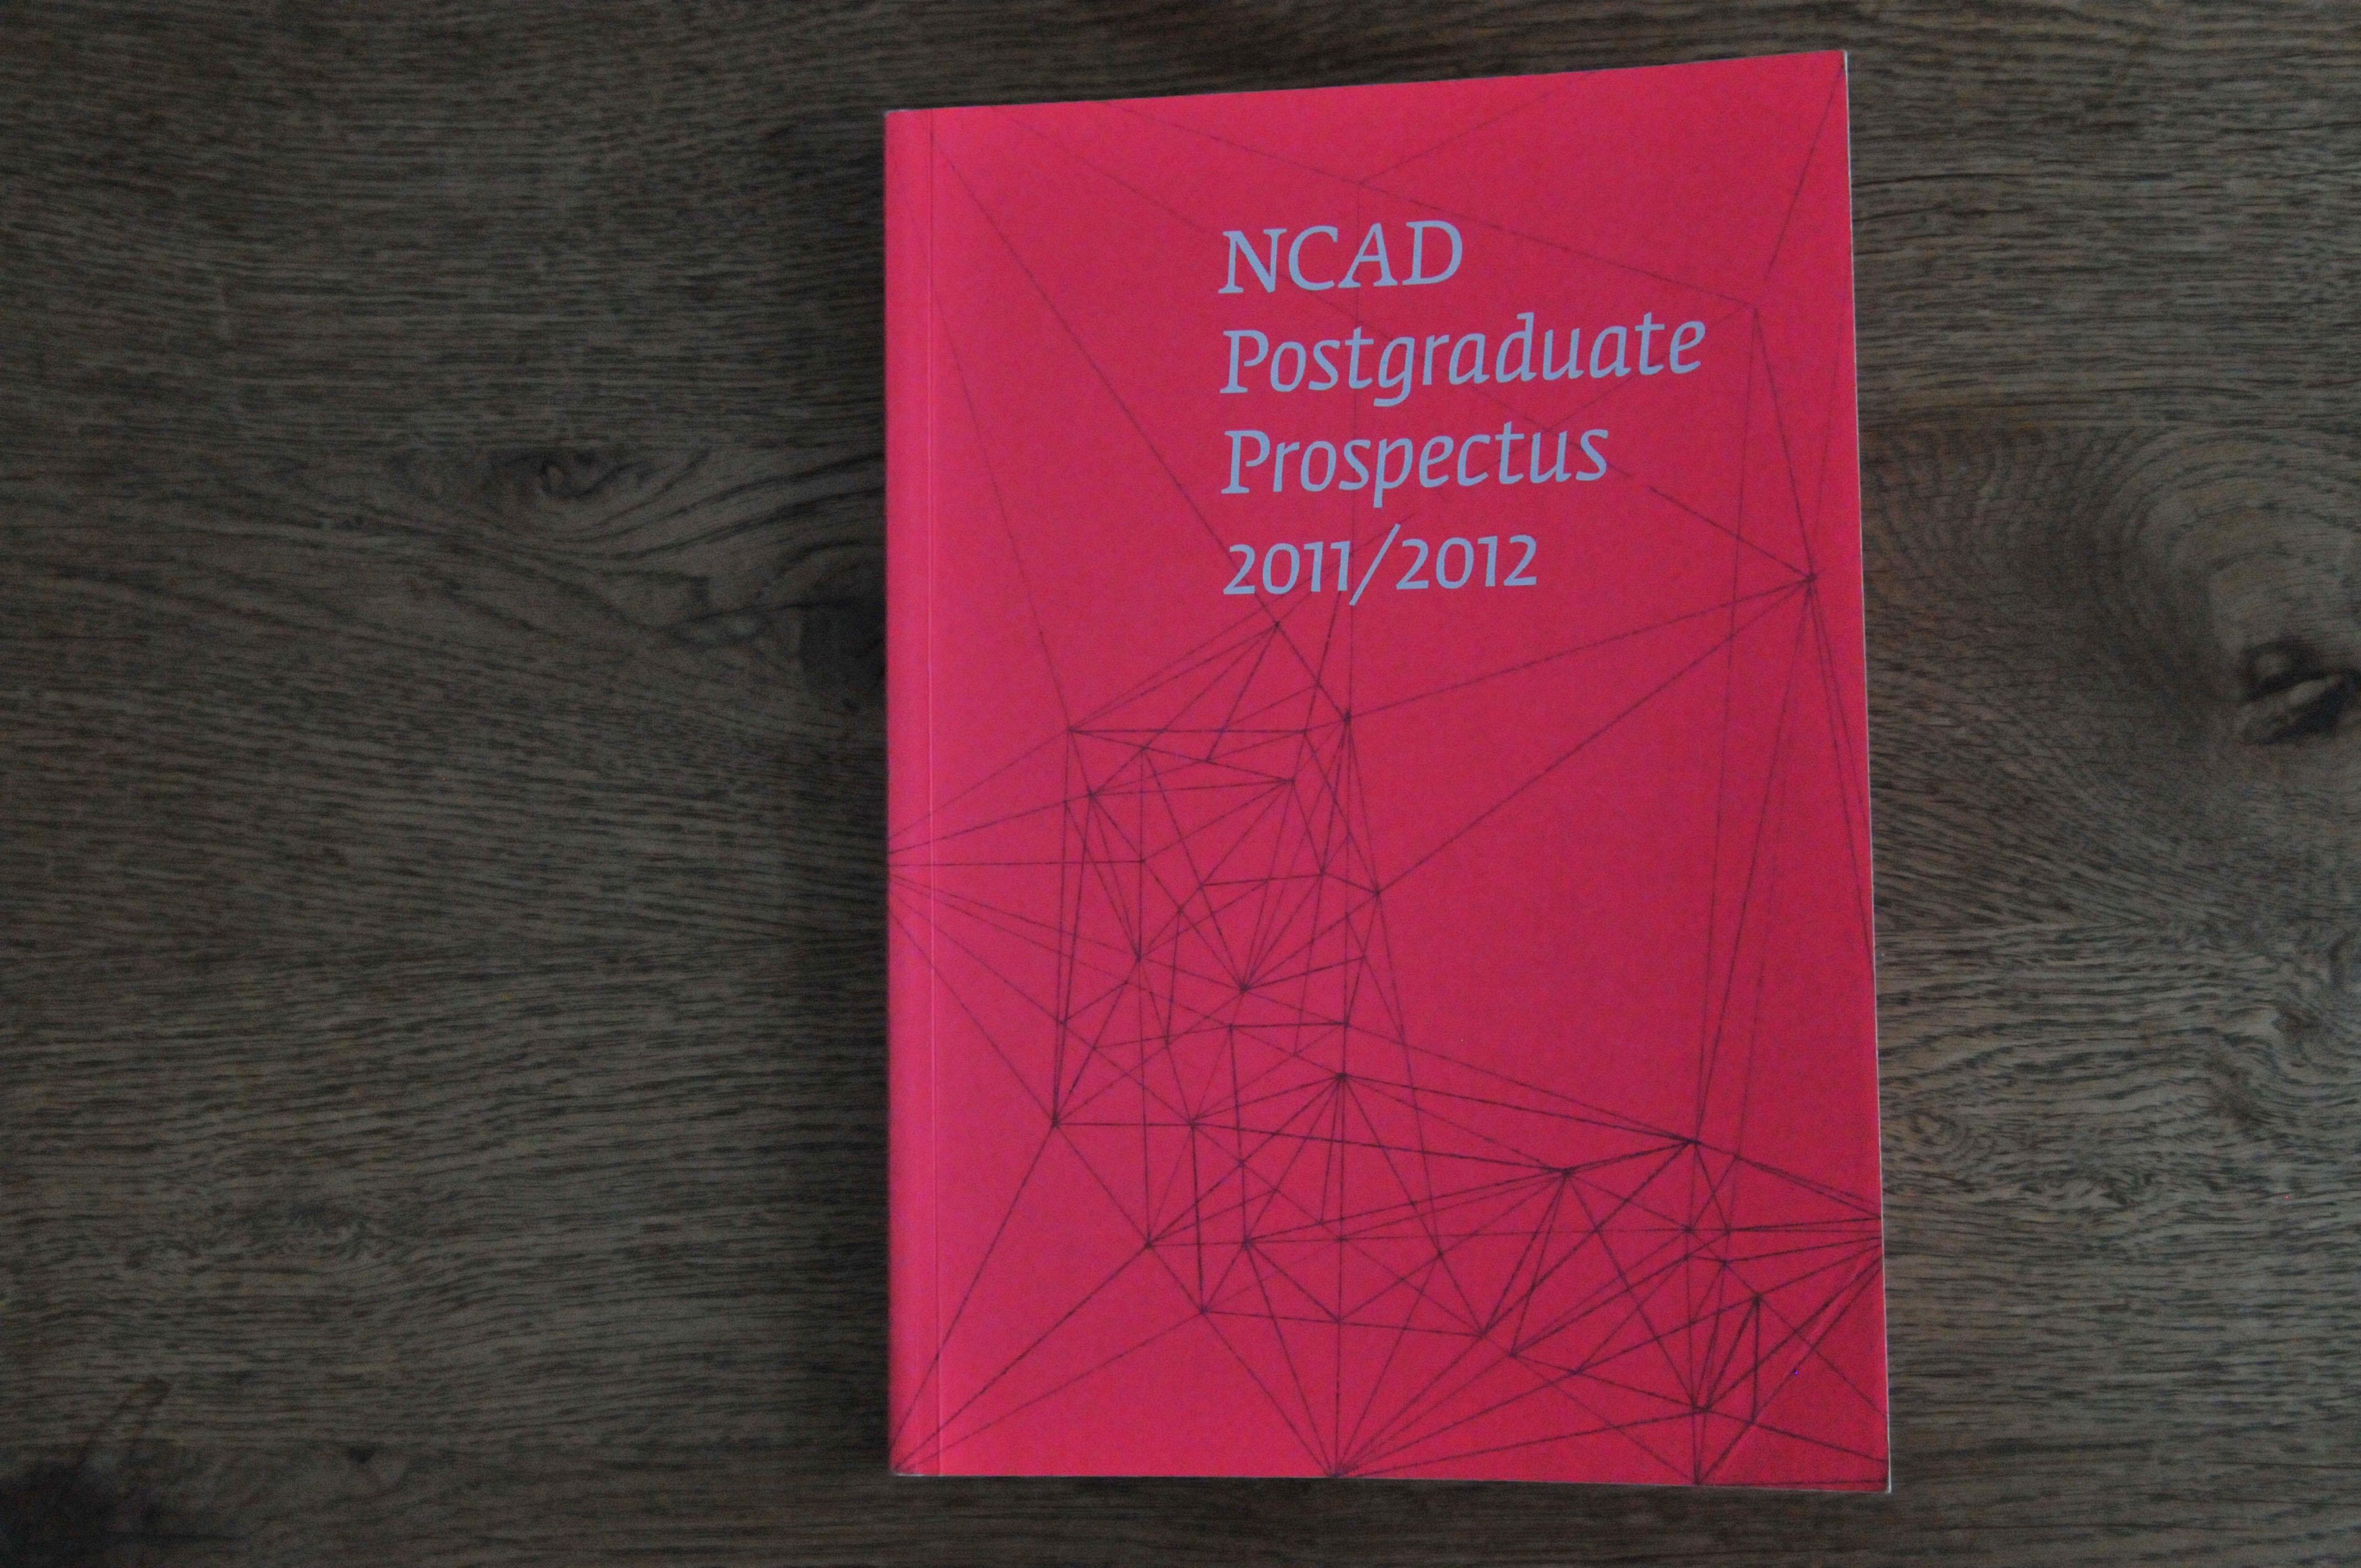 Cover image: NCAD Postgraduate Prospectus 2011/2012